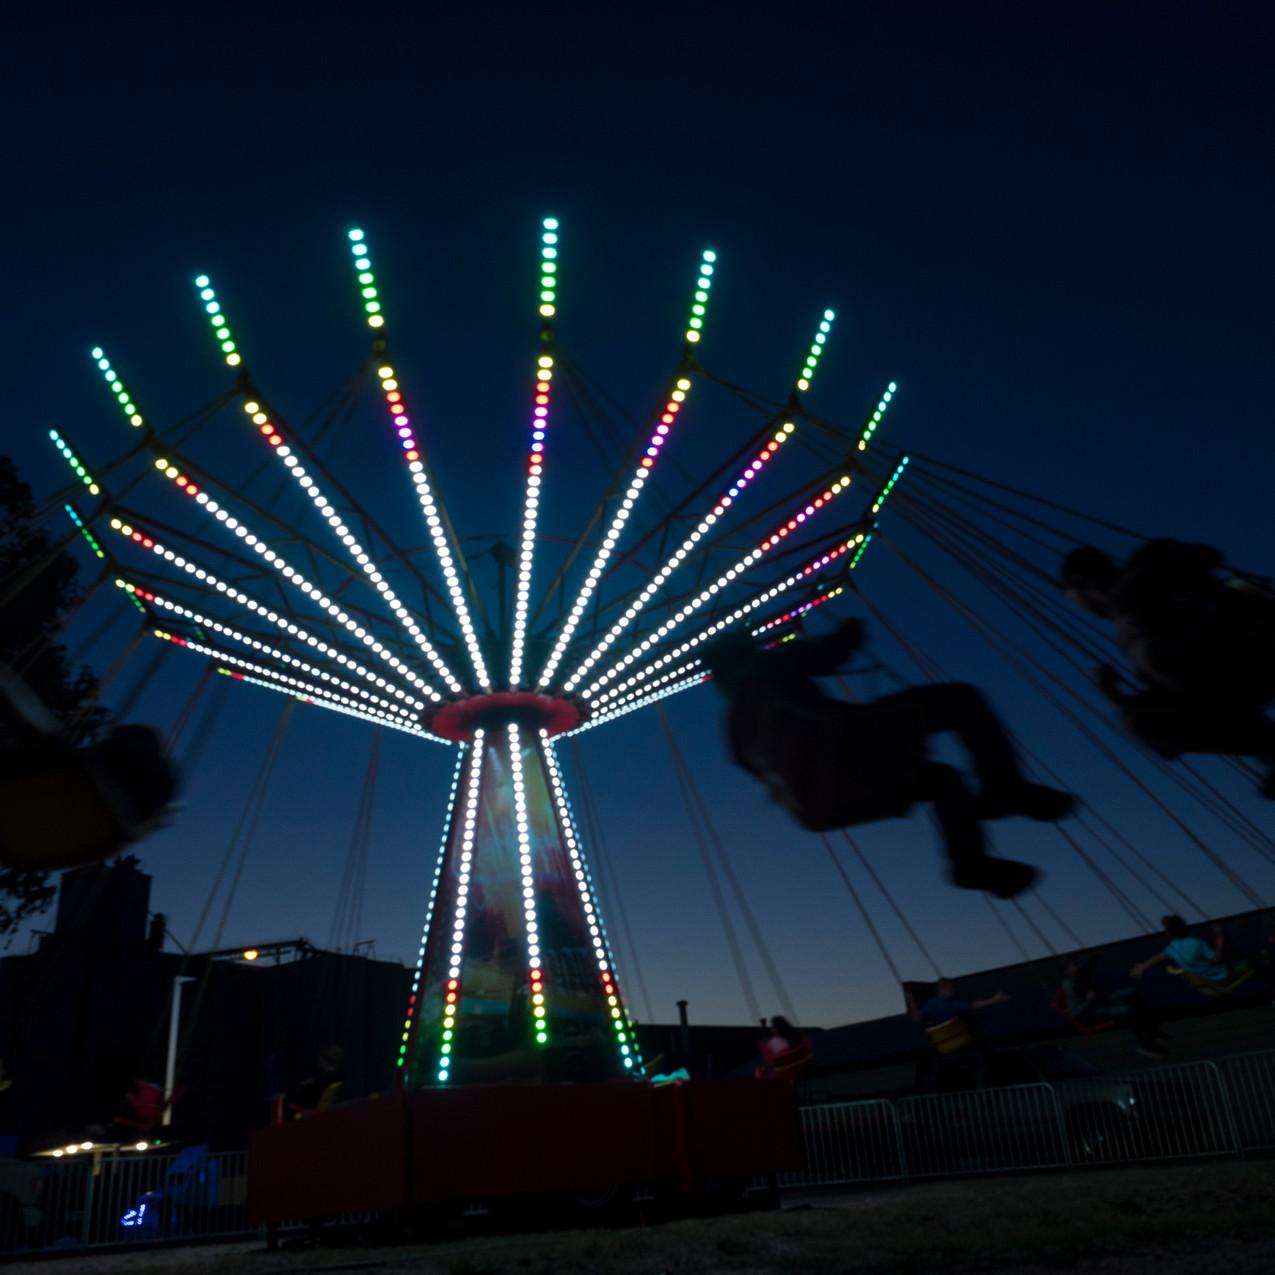 Swings at night